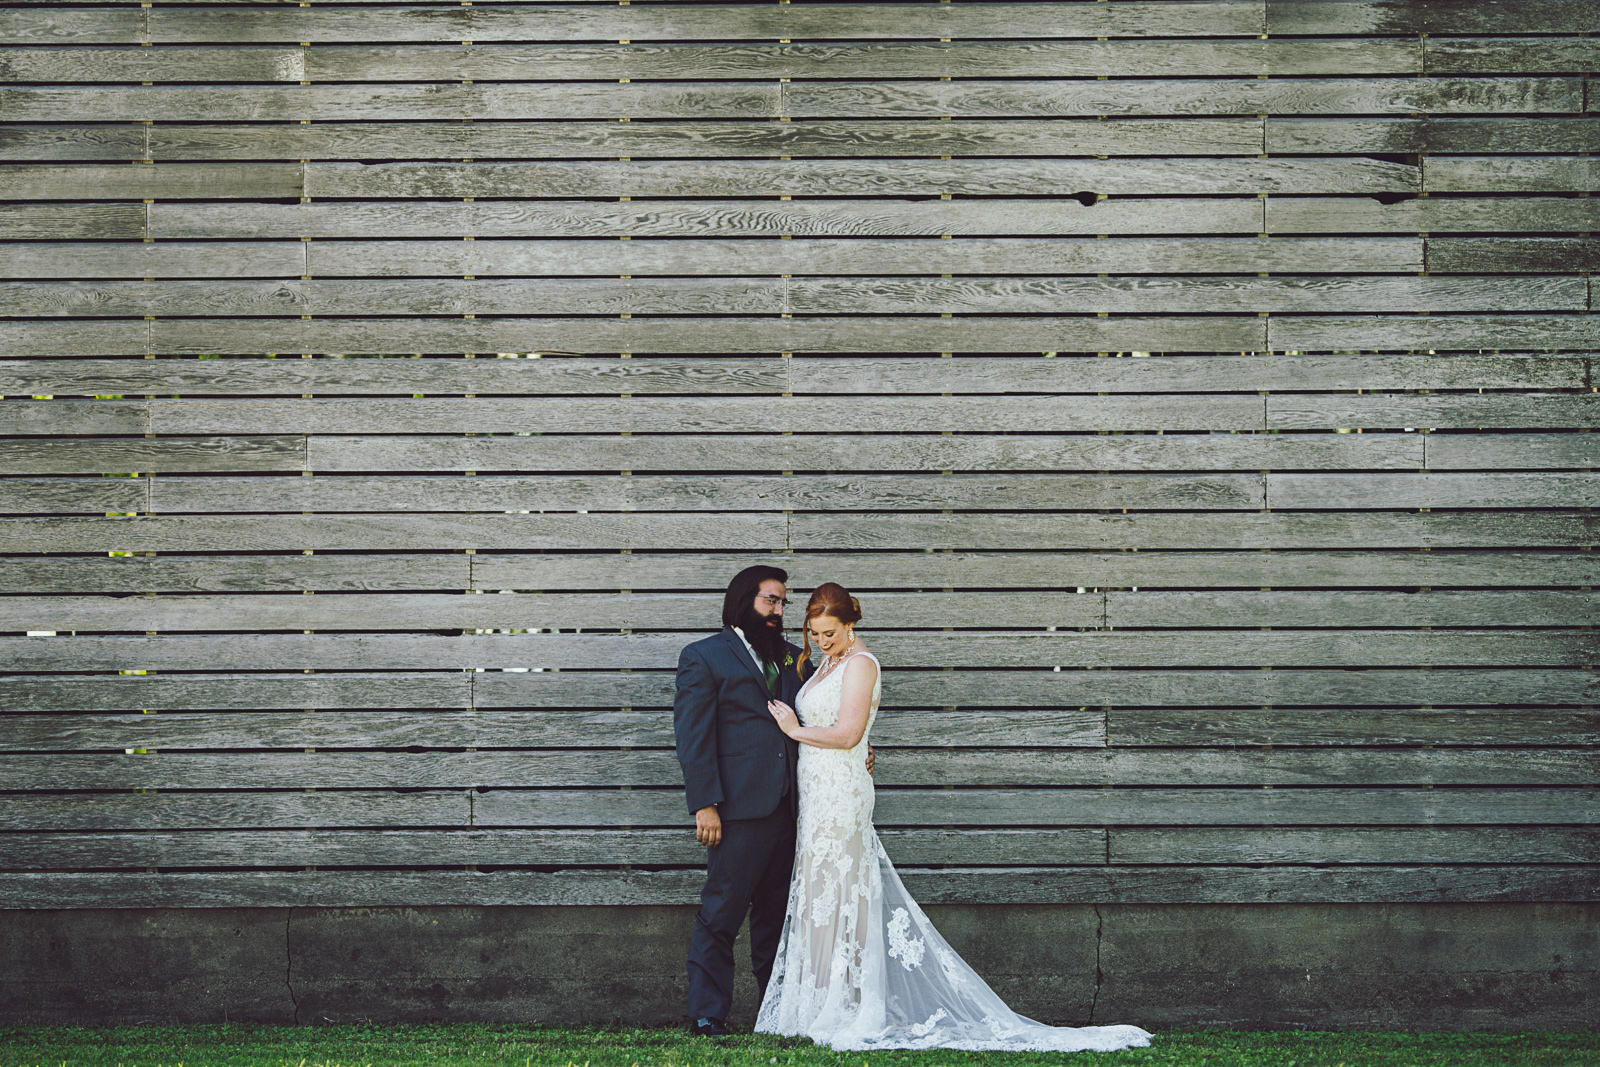 wedding-keely-caleb-347-name-your-photo.jpg